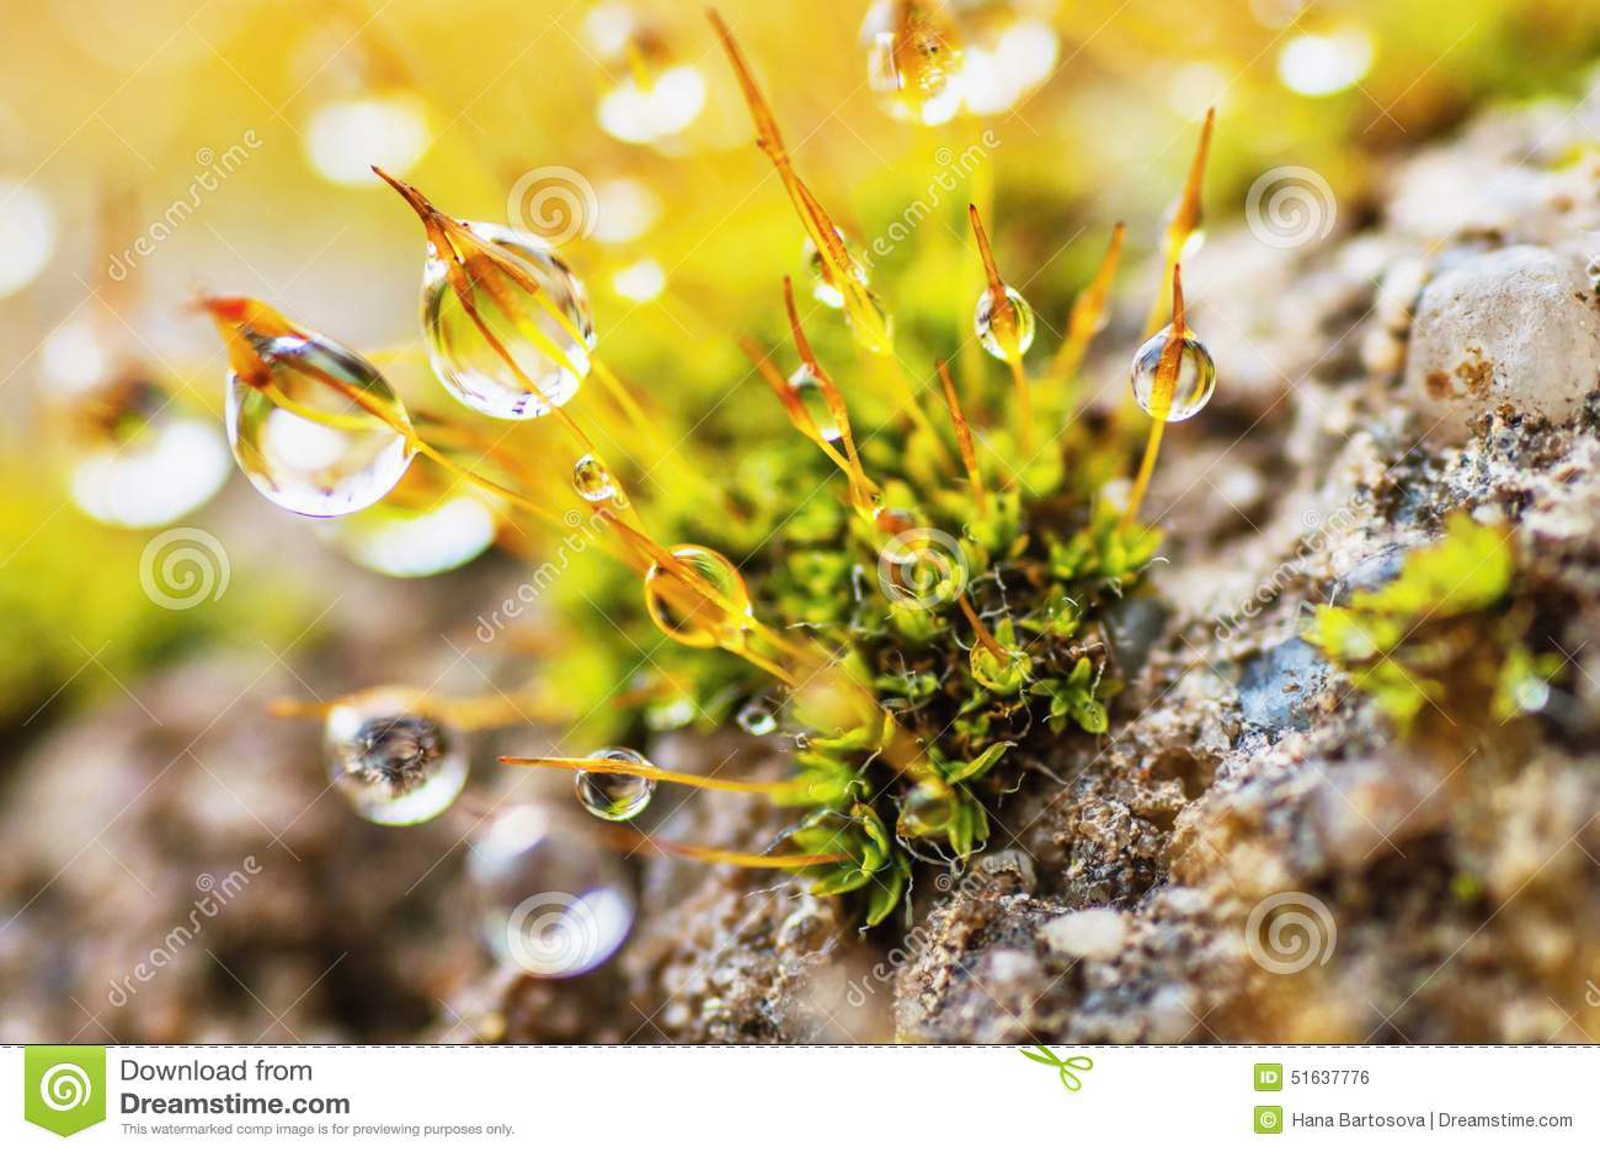 Dew drops on moss